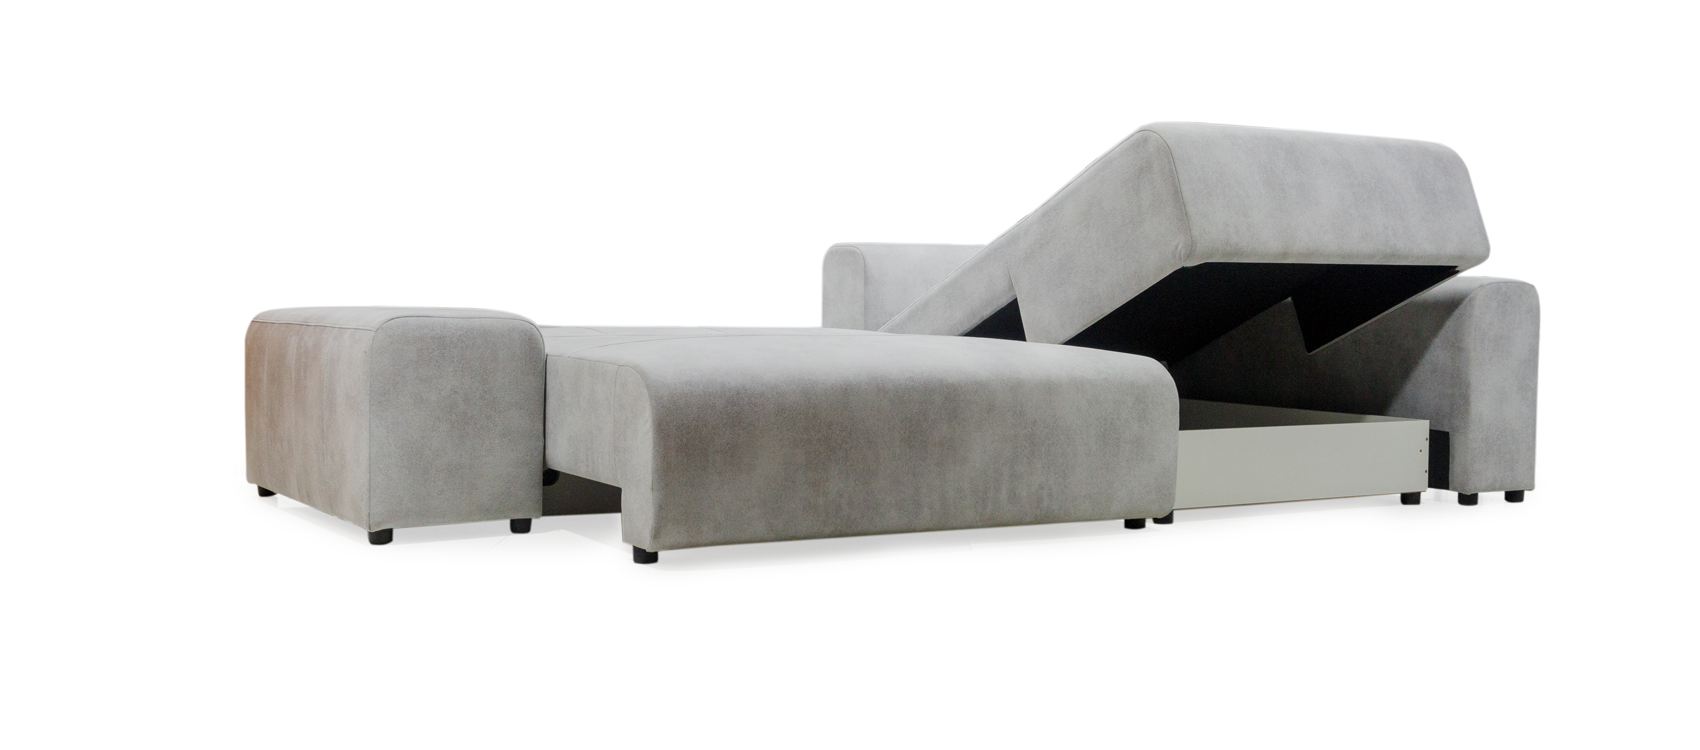 Sofa RAFT фото 4